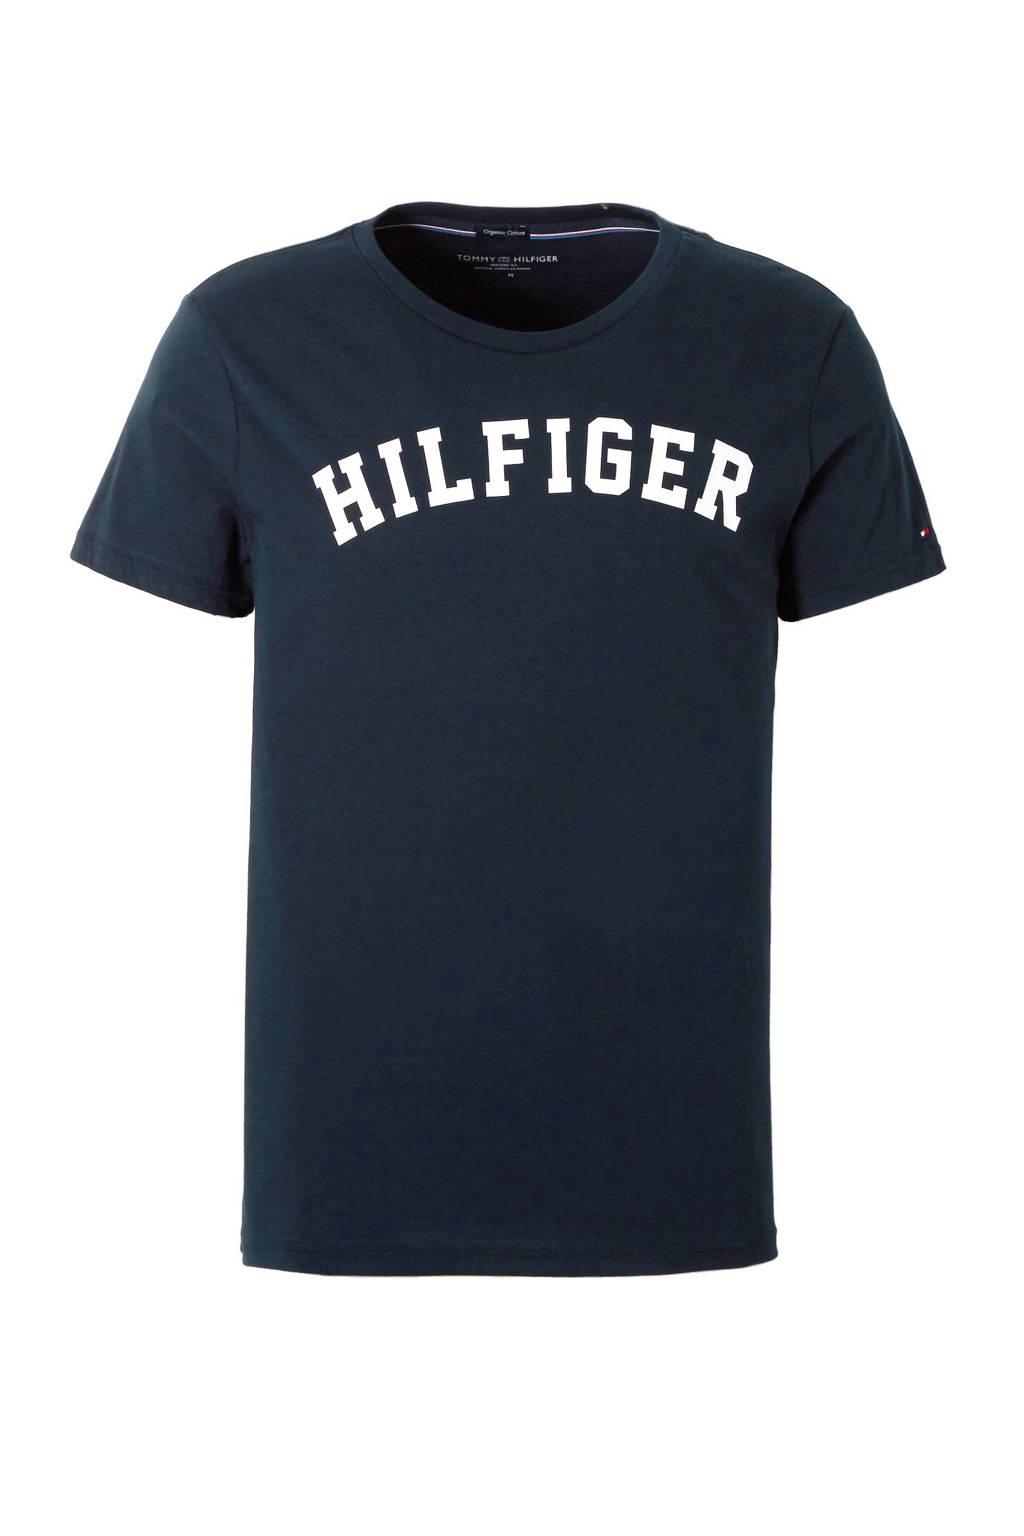 Tommy Hilfiger T-shirt, Marine/wit